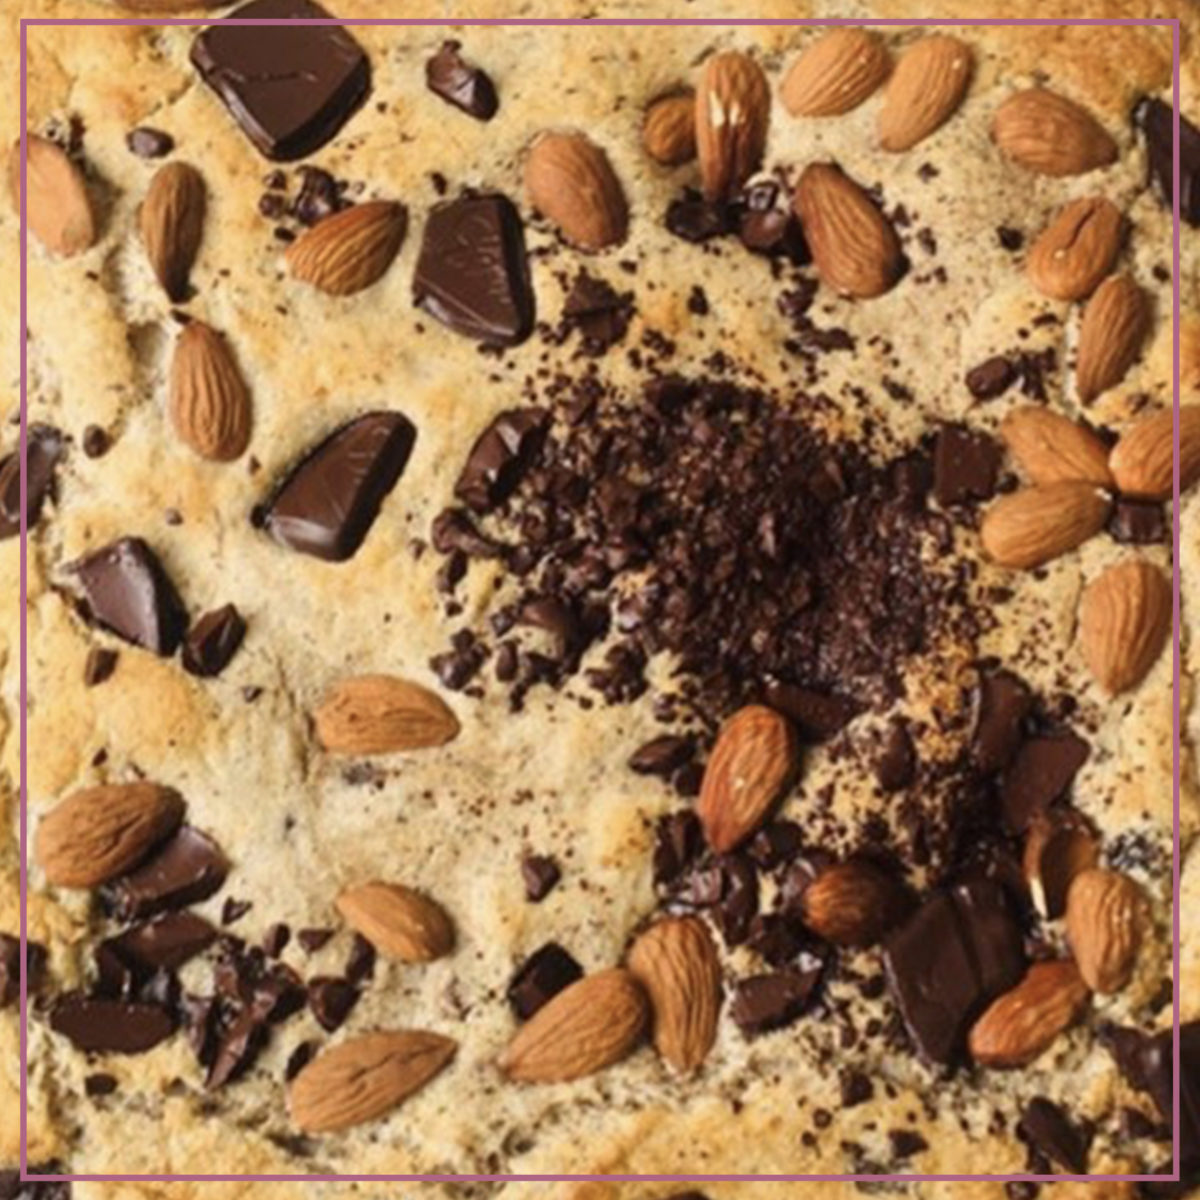 0-Torta-albumi-senza-zucchero-e-senza-glutin-1200x1200.jpg